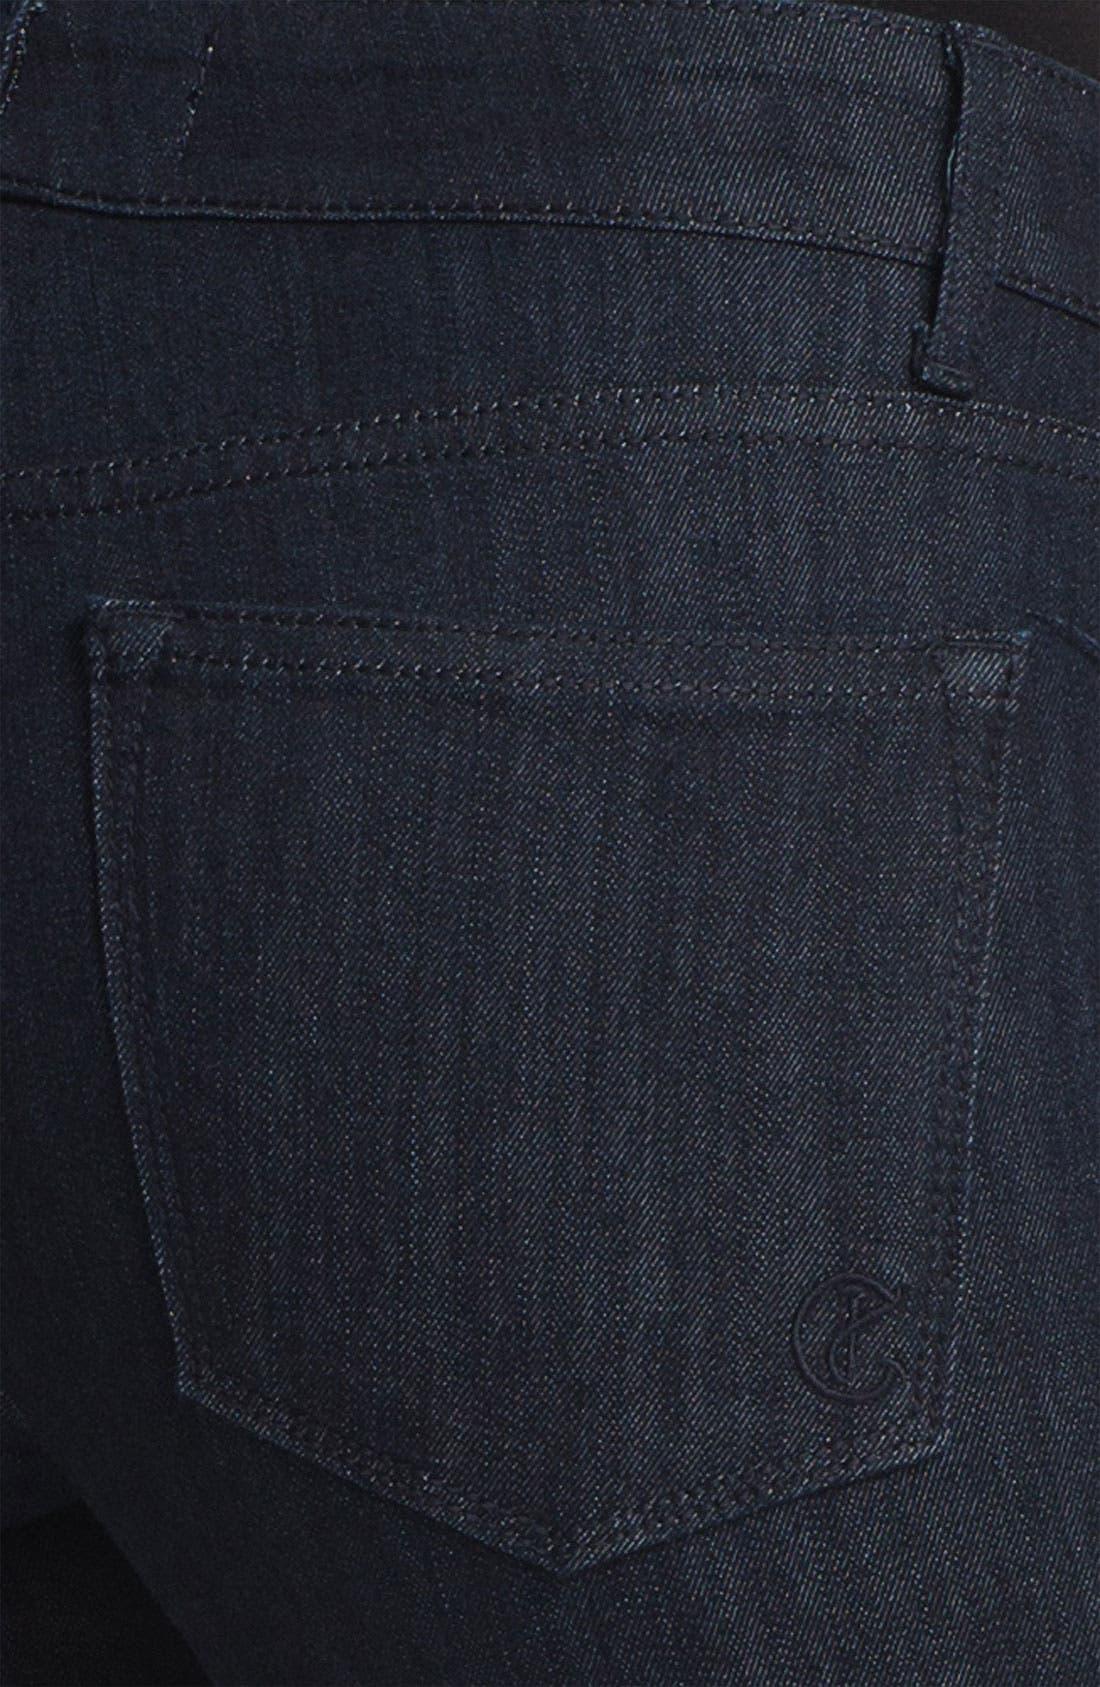 Alternate Image 3  - CJ by Cookie Johnson 'Joy' Stretch Skinny Jeans